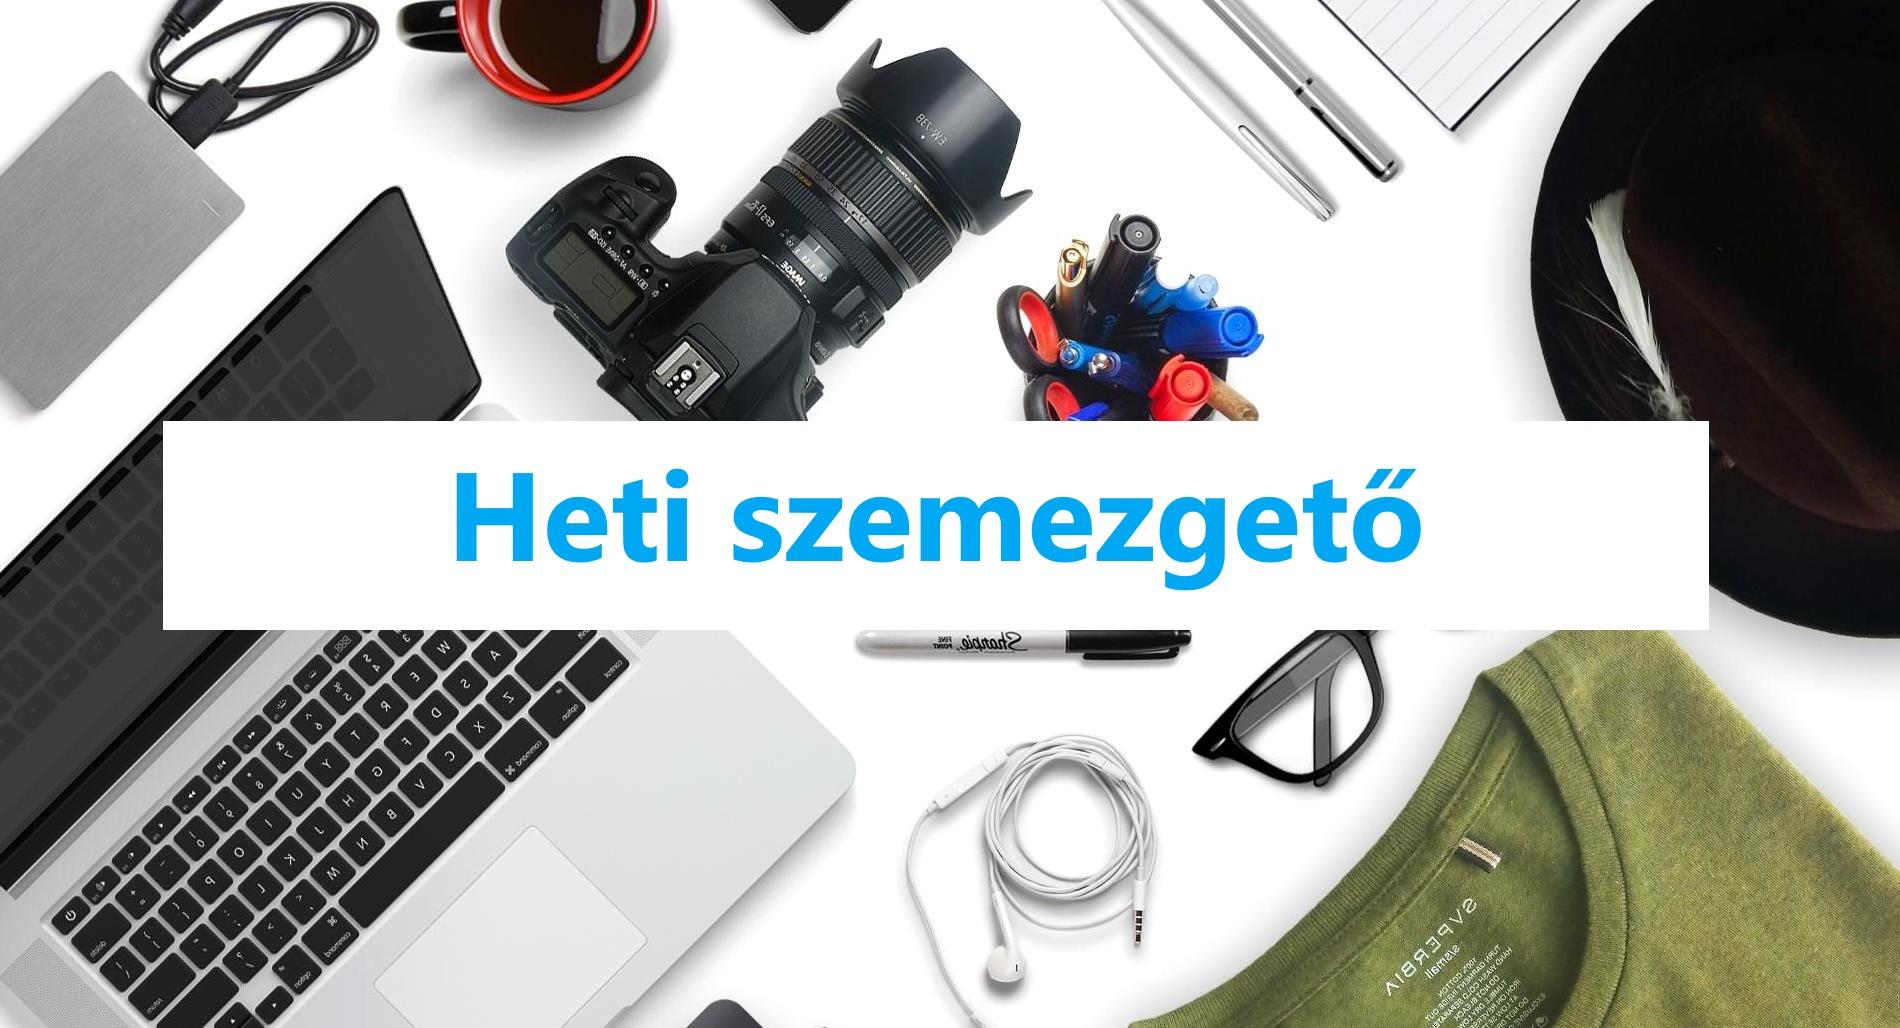 heti_szemezgeto_uj_22.jpg